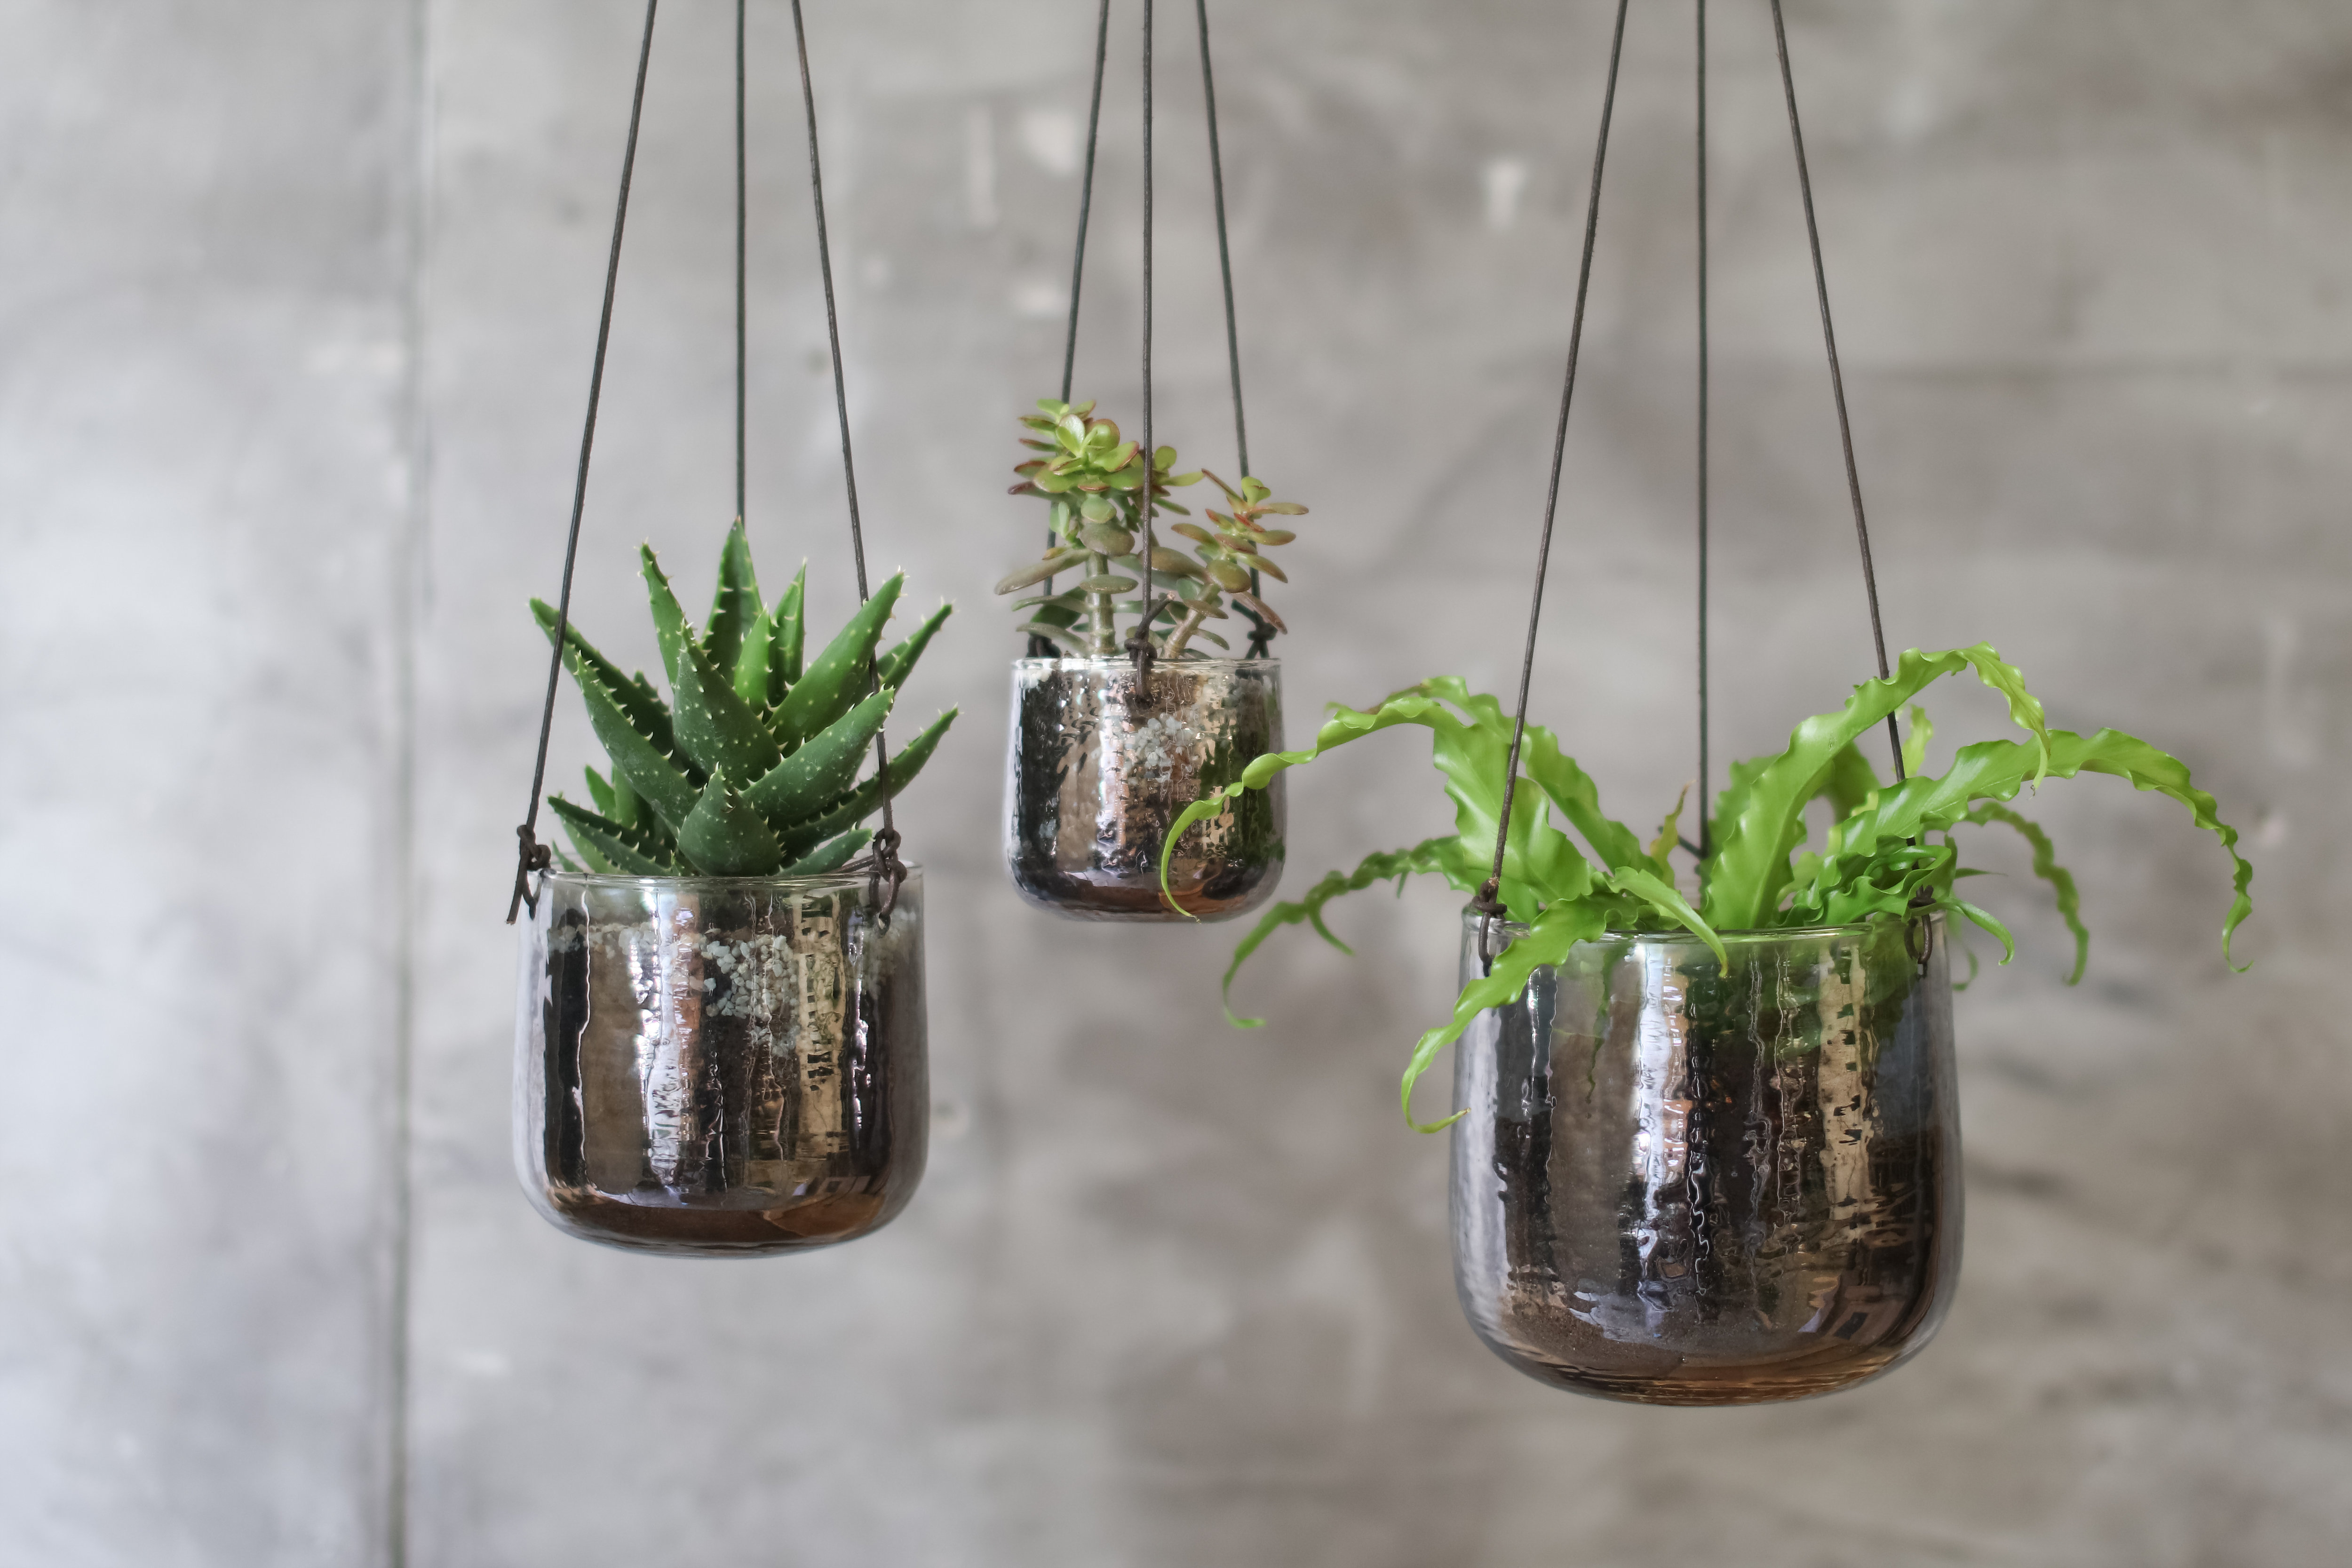 aged-silver-glass-handing-planter-medium